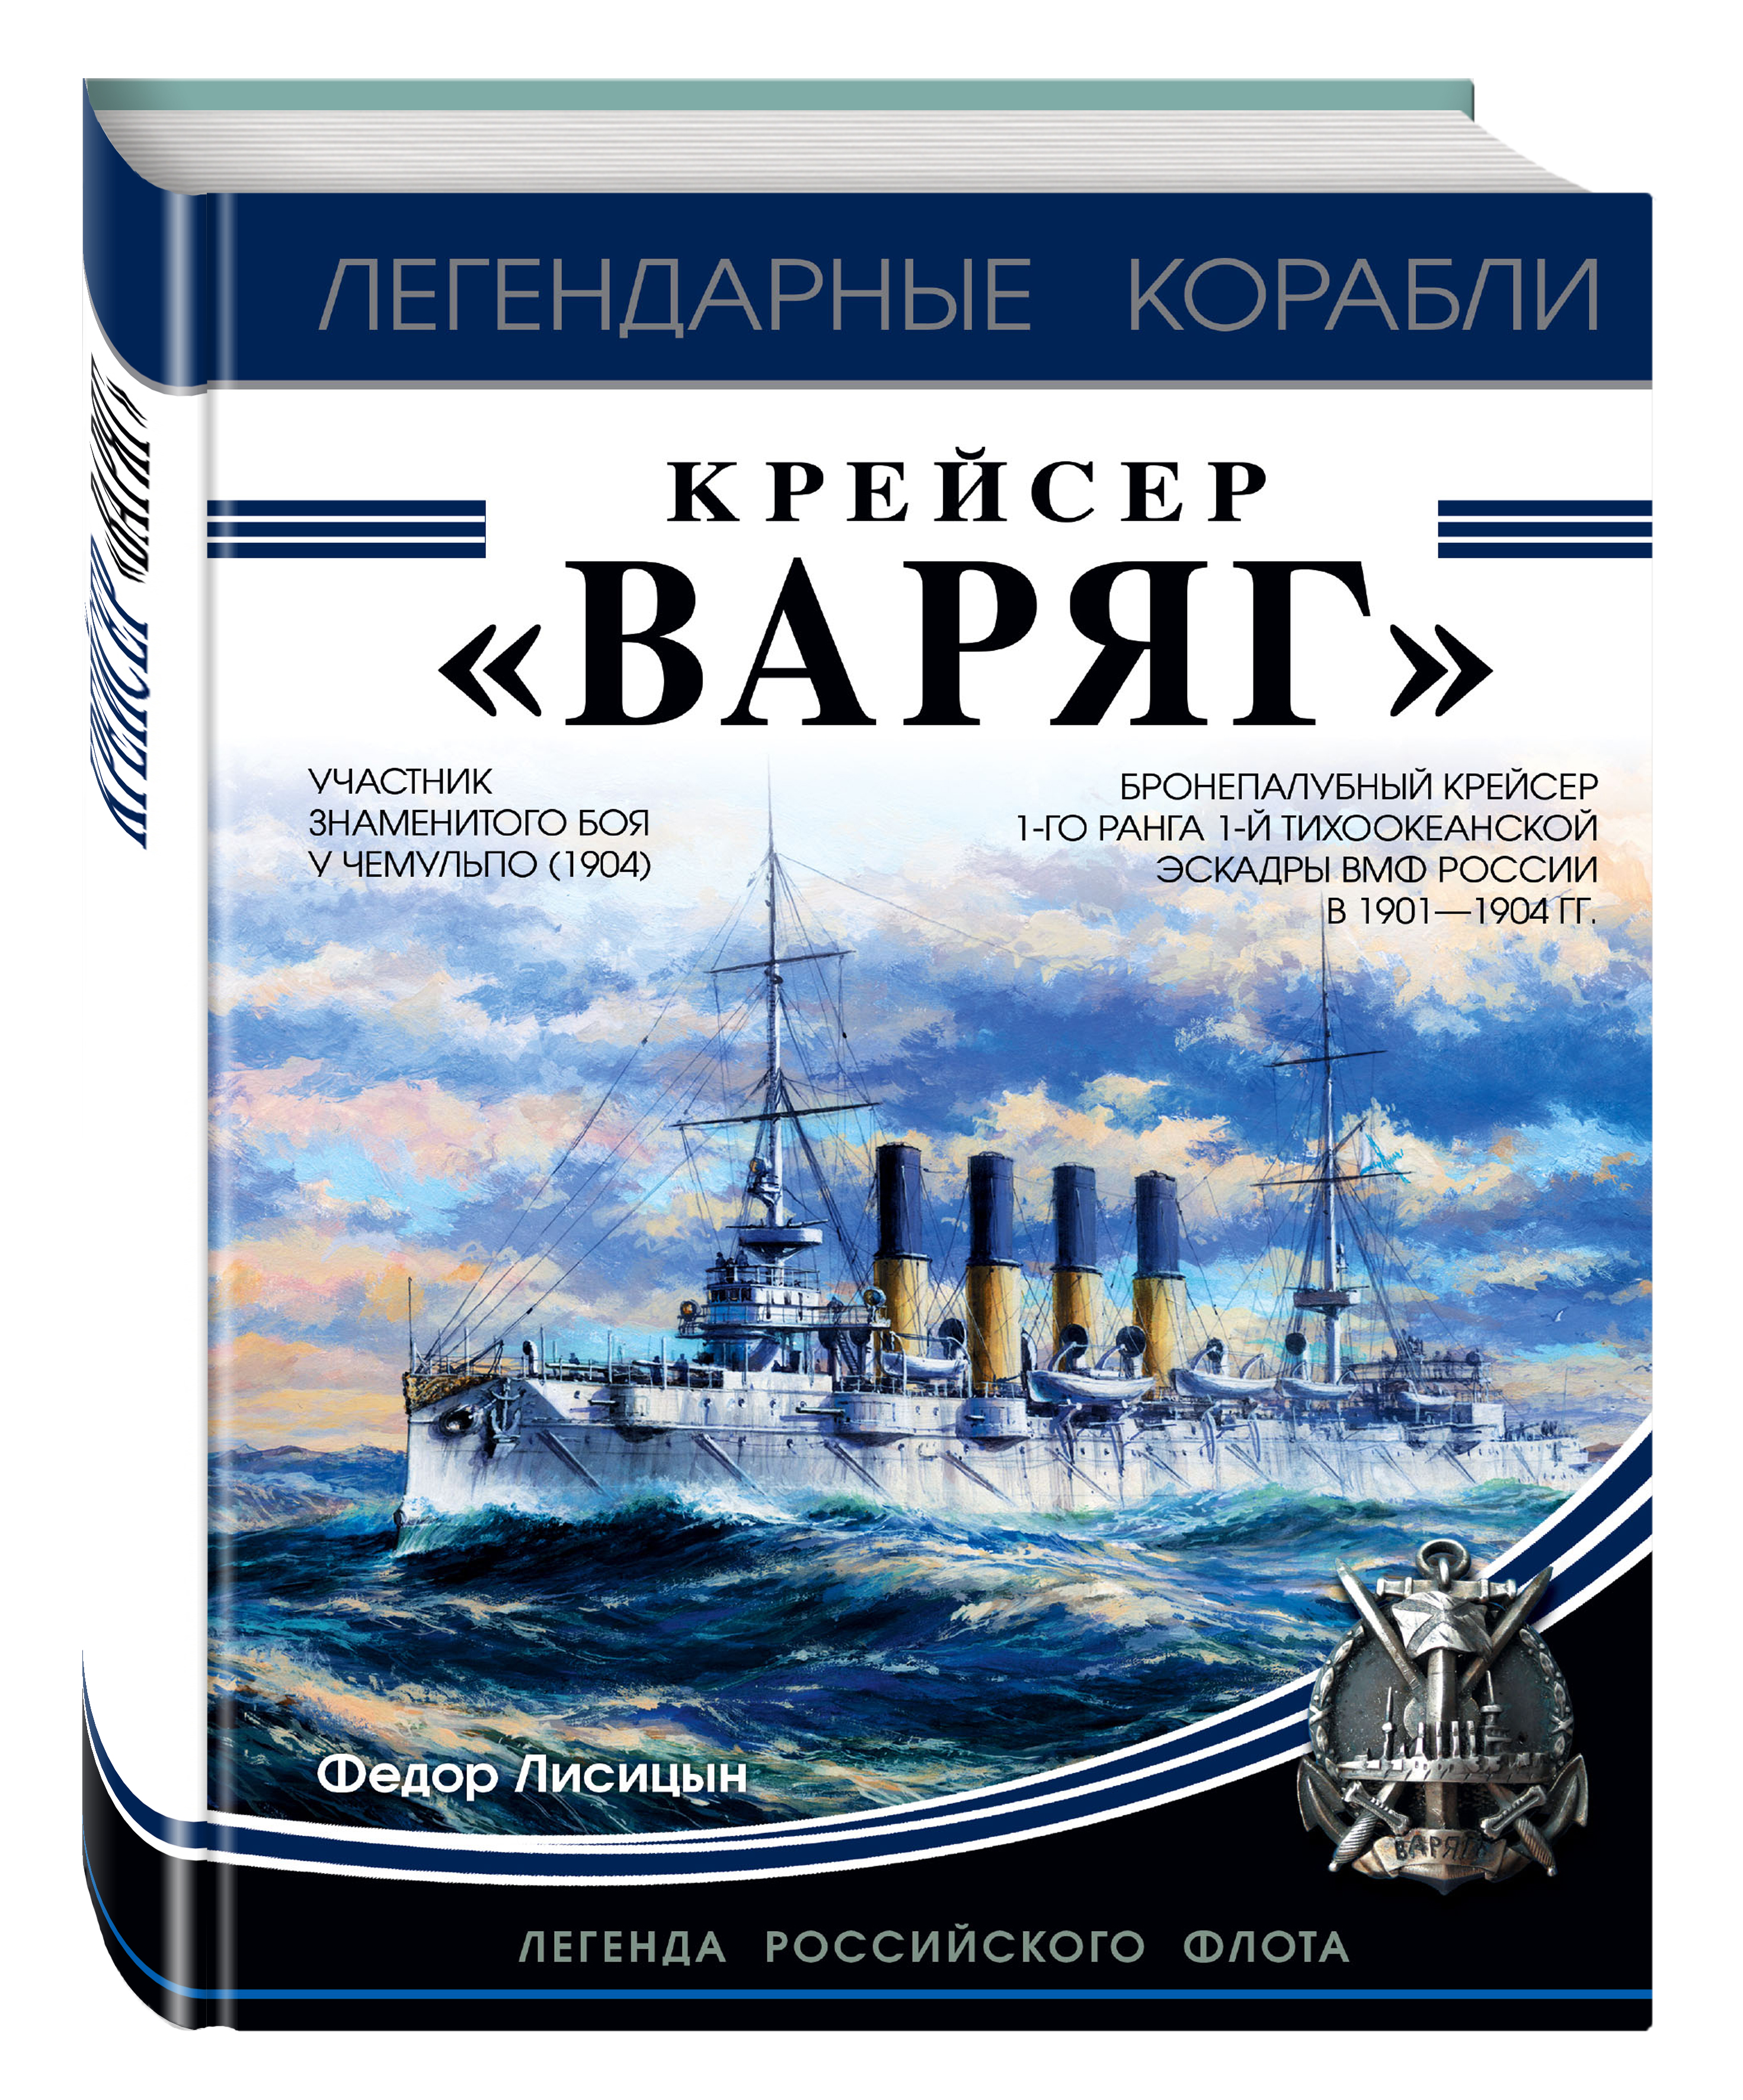 Федор Лисицын Крейсер «Варяг» фёдор лисицын крейсер варяг isbn 978 5 699 84530 9